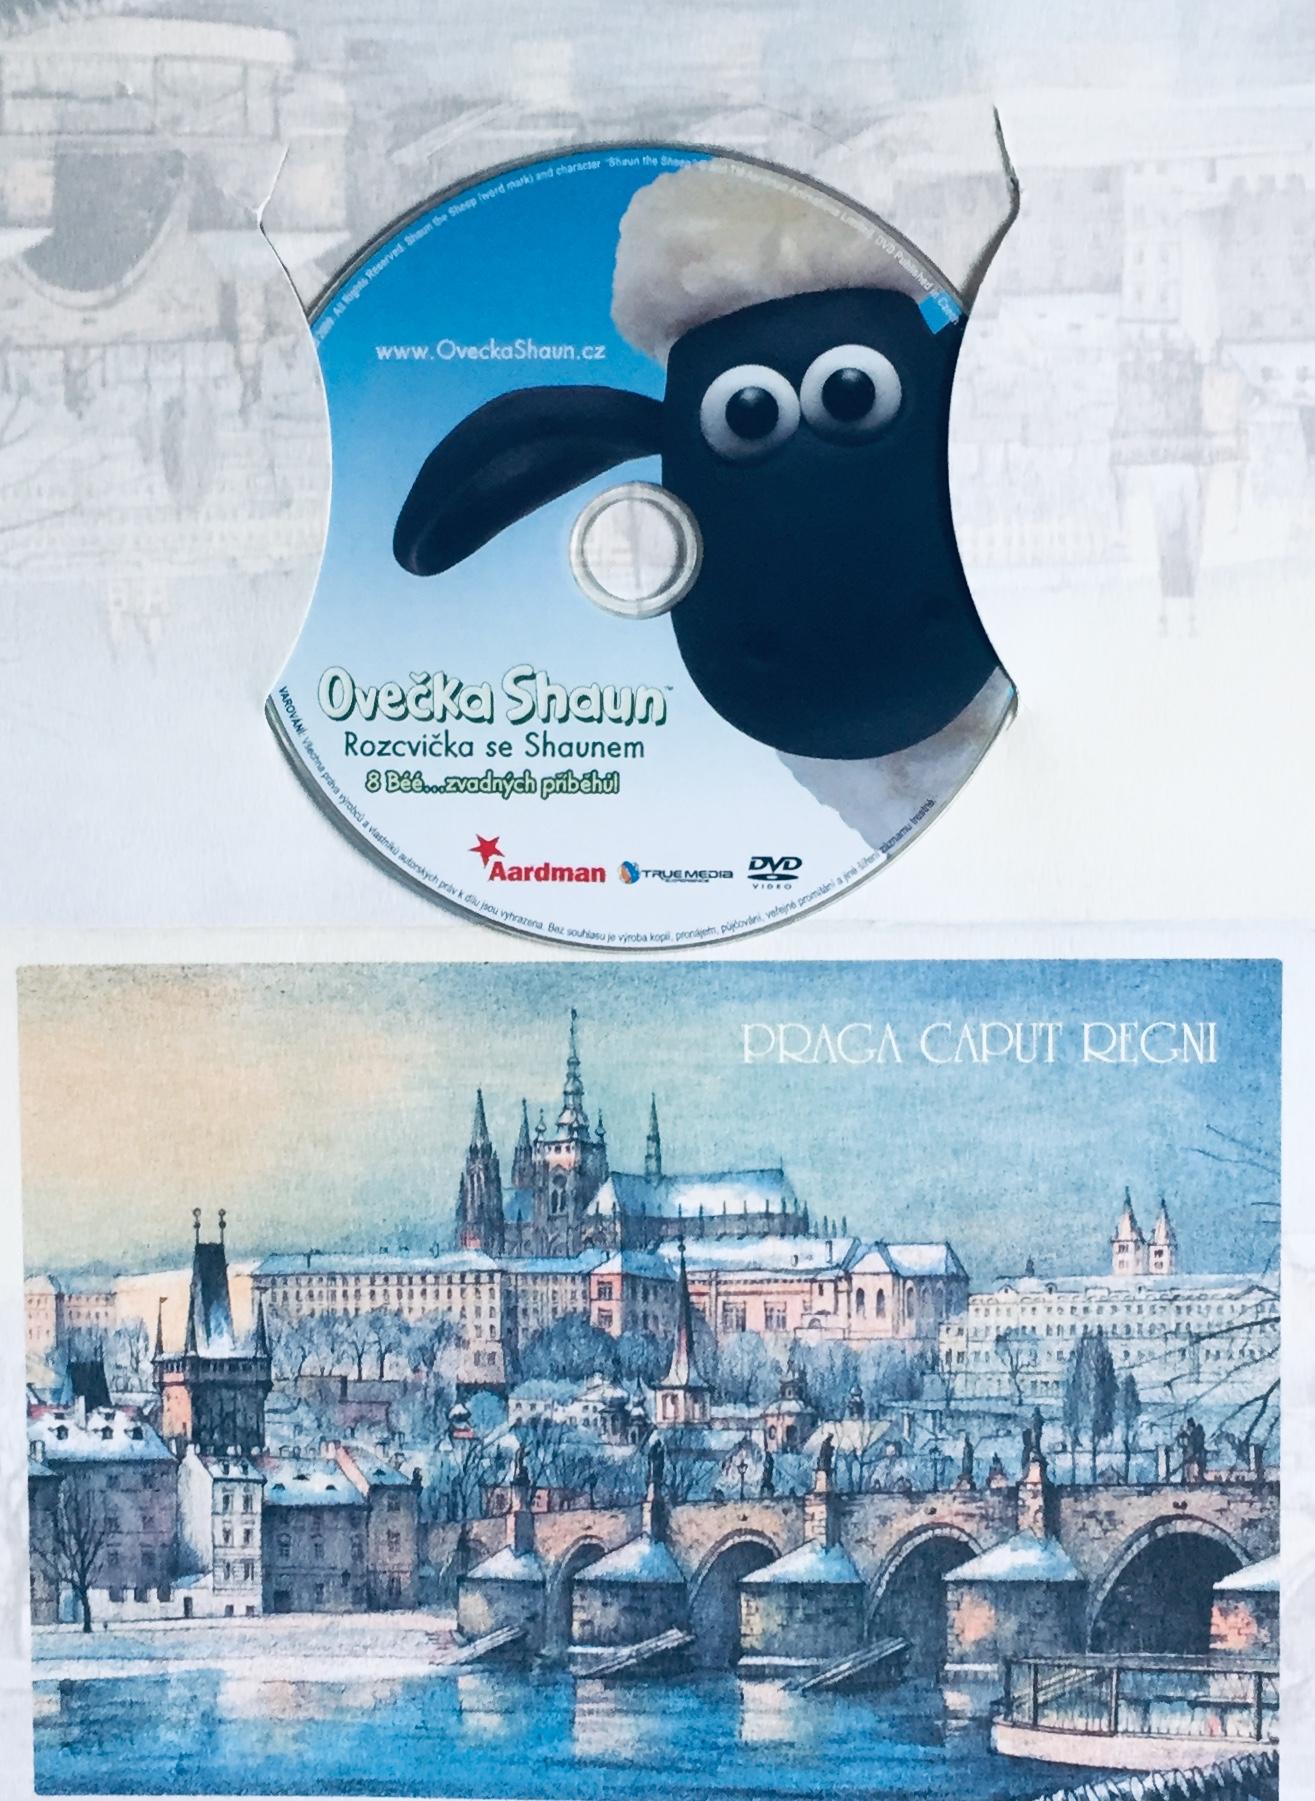 Ovečka Shaun - Rozcvička se Shaunem - DVD /dárkový obal/